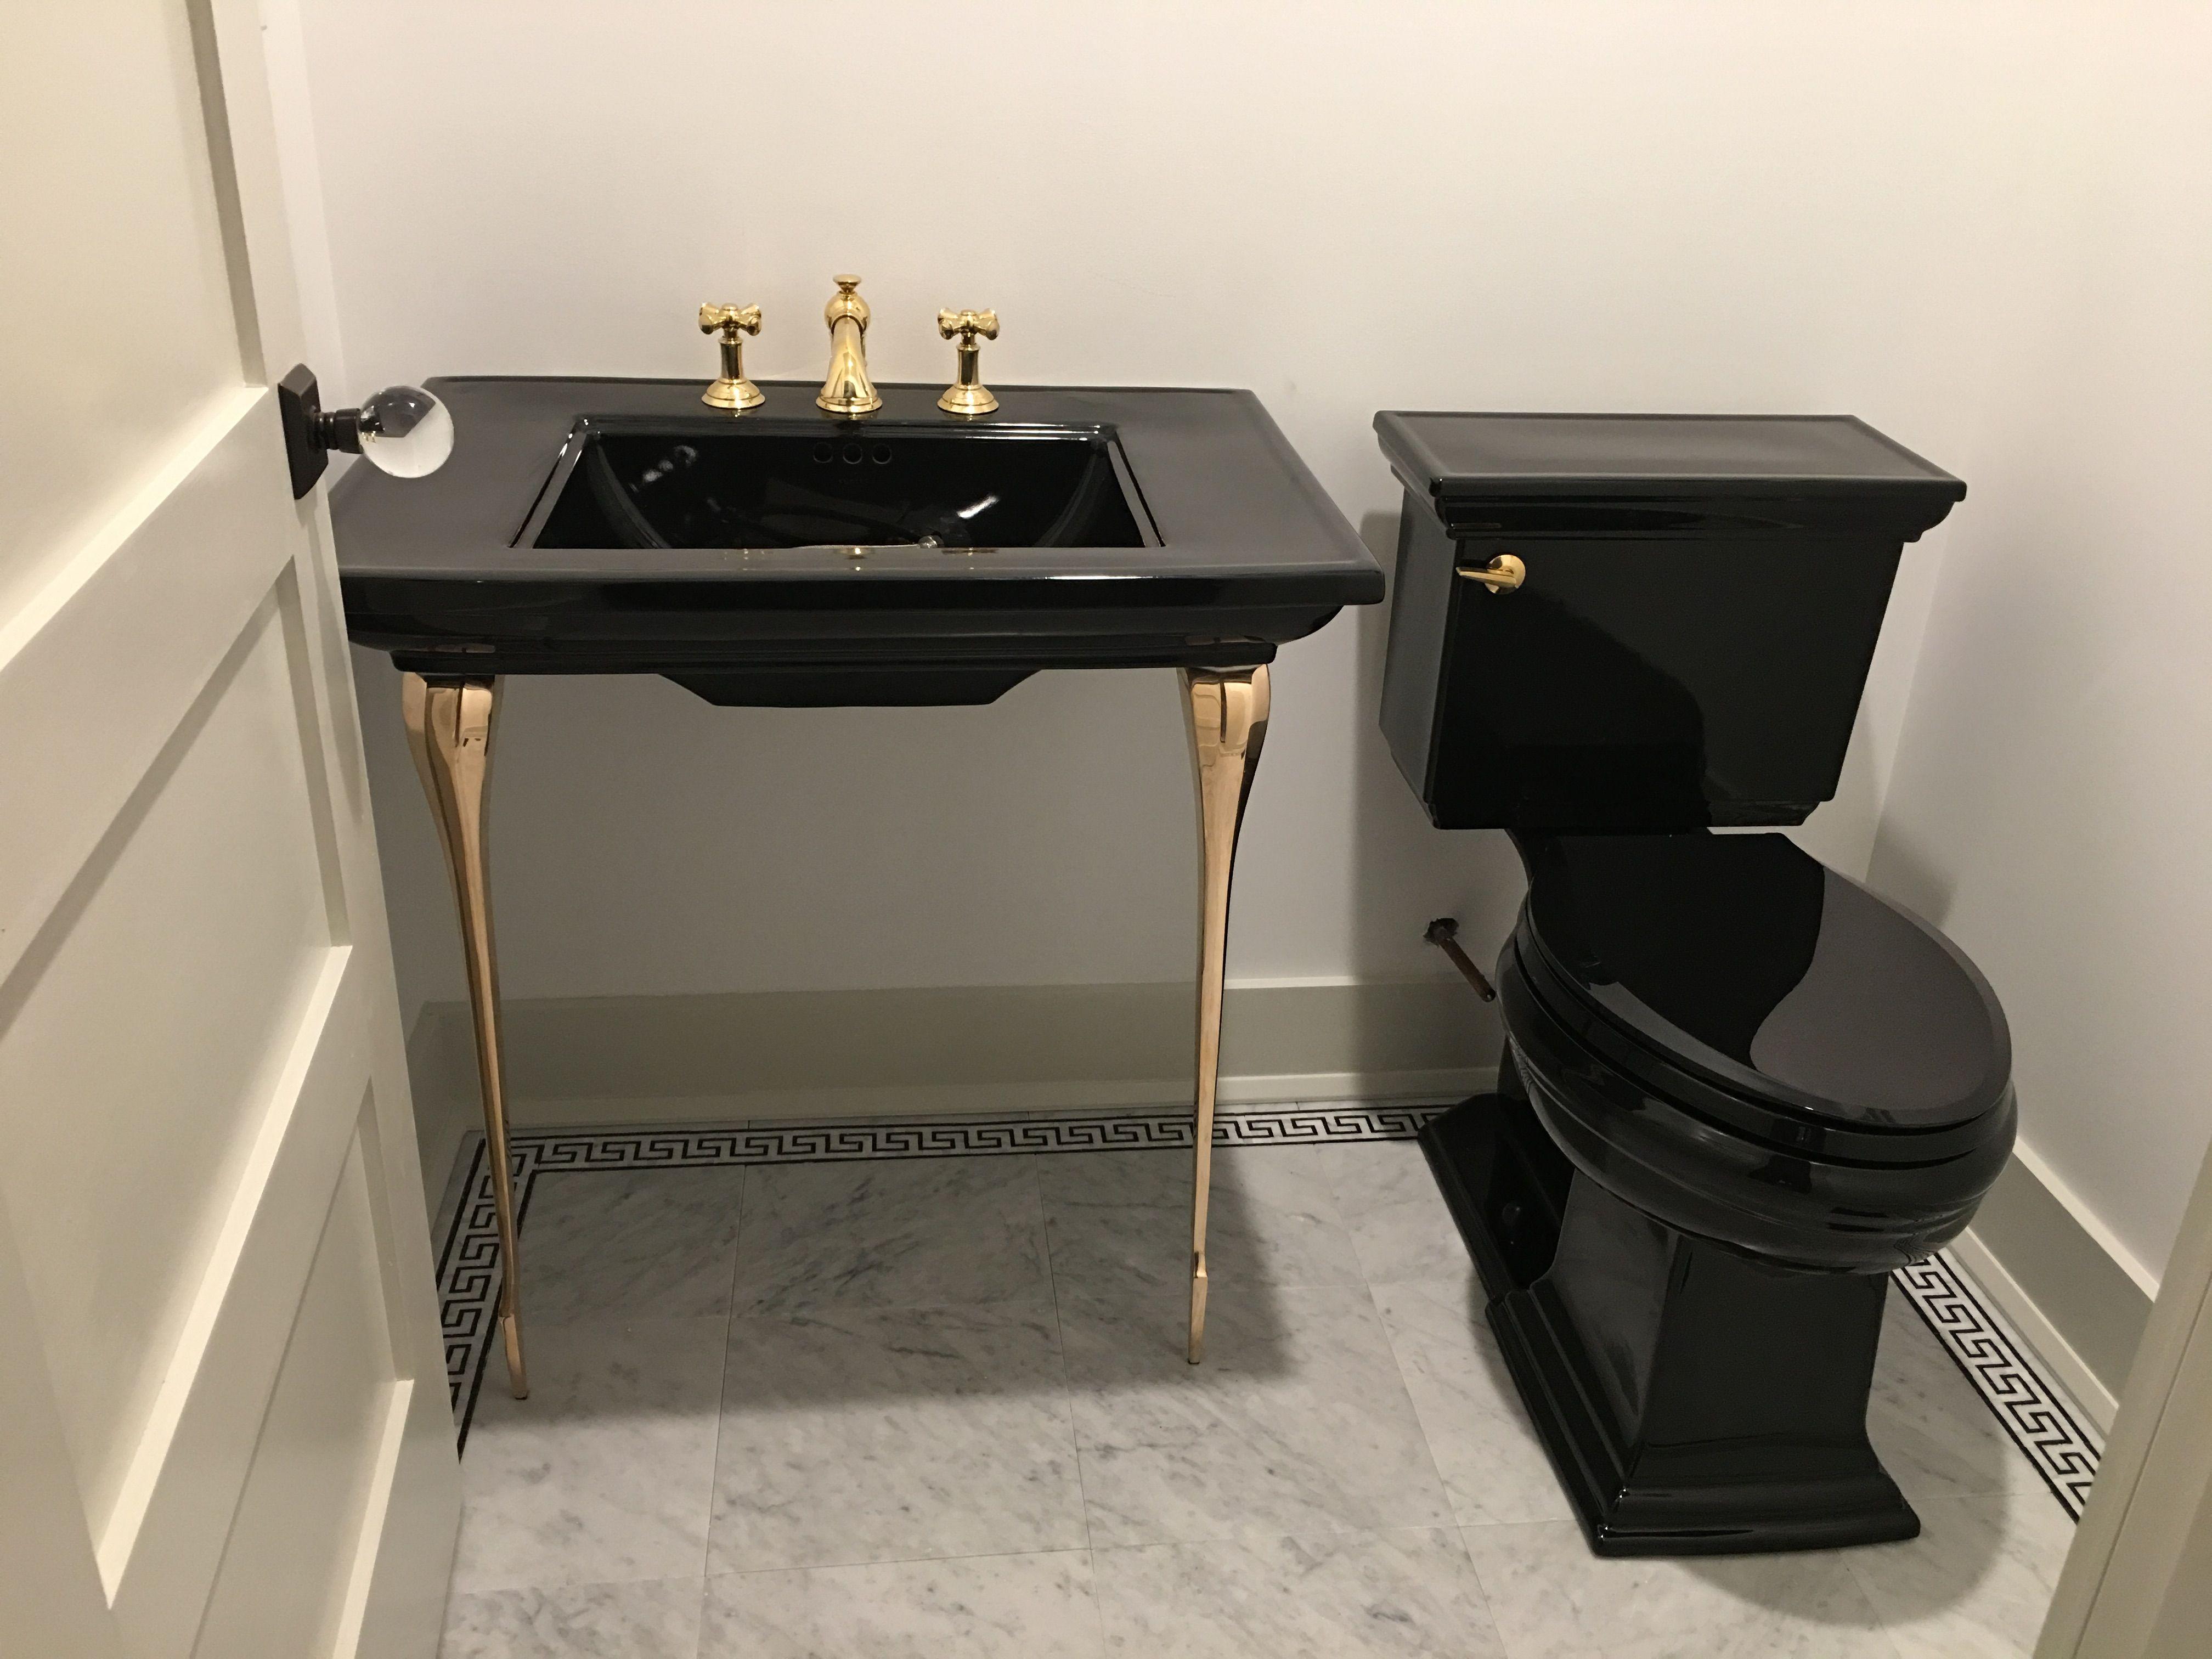 Kohler memoirs sink and two piece toilet original s art deco